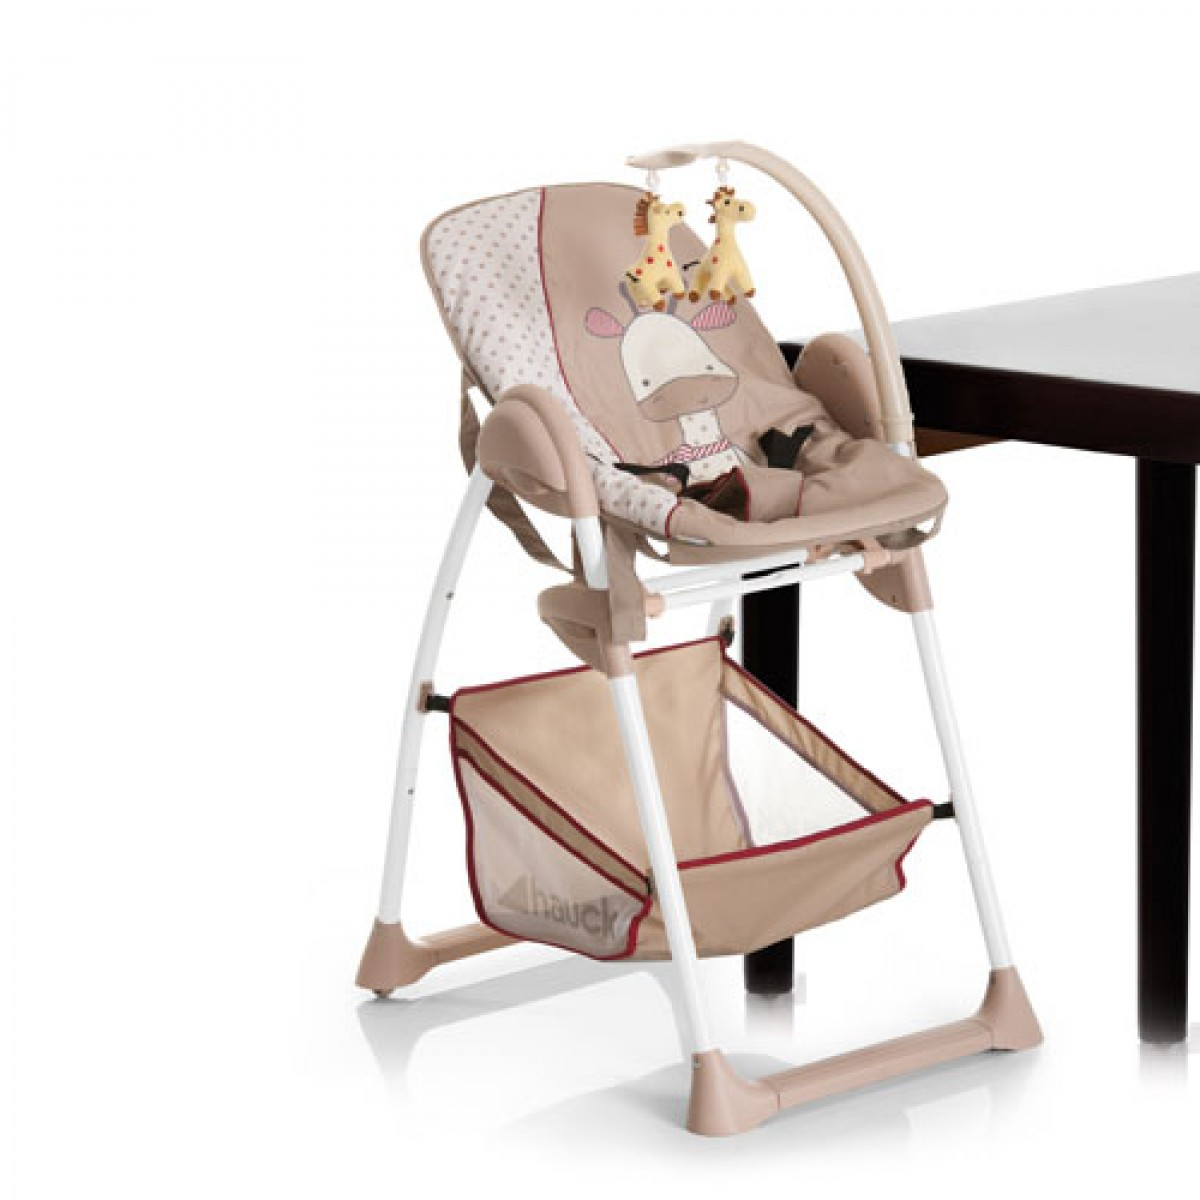 hauck stuhl top via amazon with hauck stuhl stunning elegante hauck hochstuhl situn relax. Black Bedroom Furniture Sets. Home Design Ideas